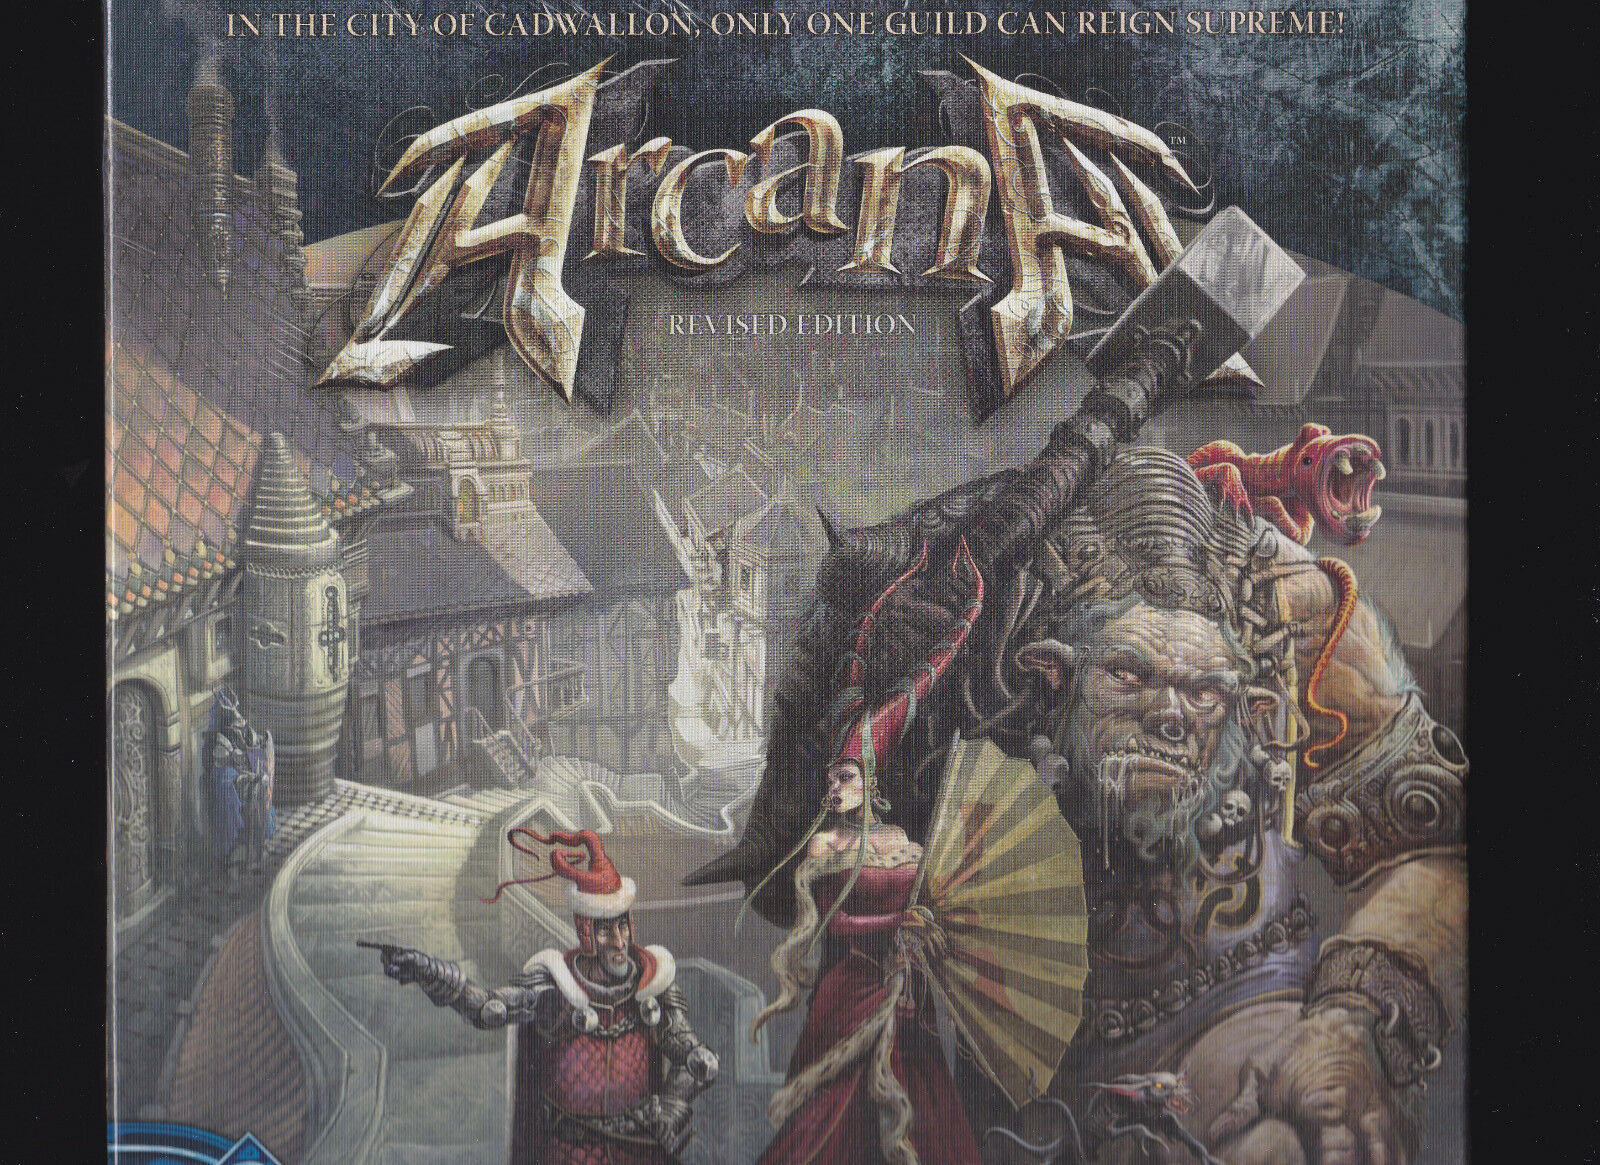 Arcana Revised Edition - Fantasy Flight Games - Board Game New   NIB